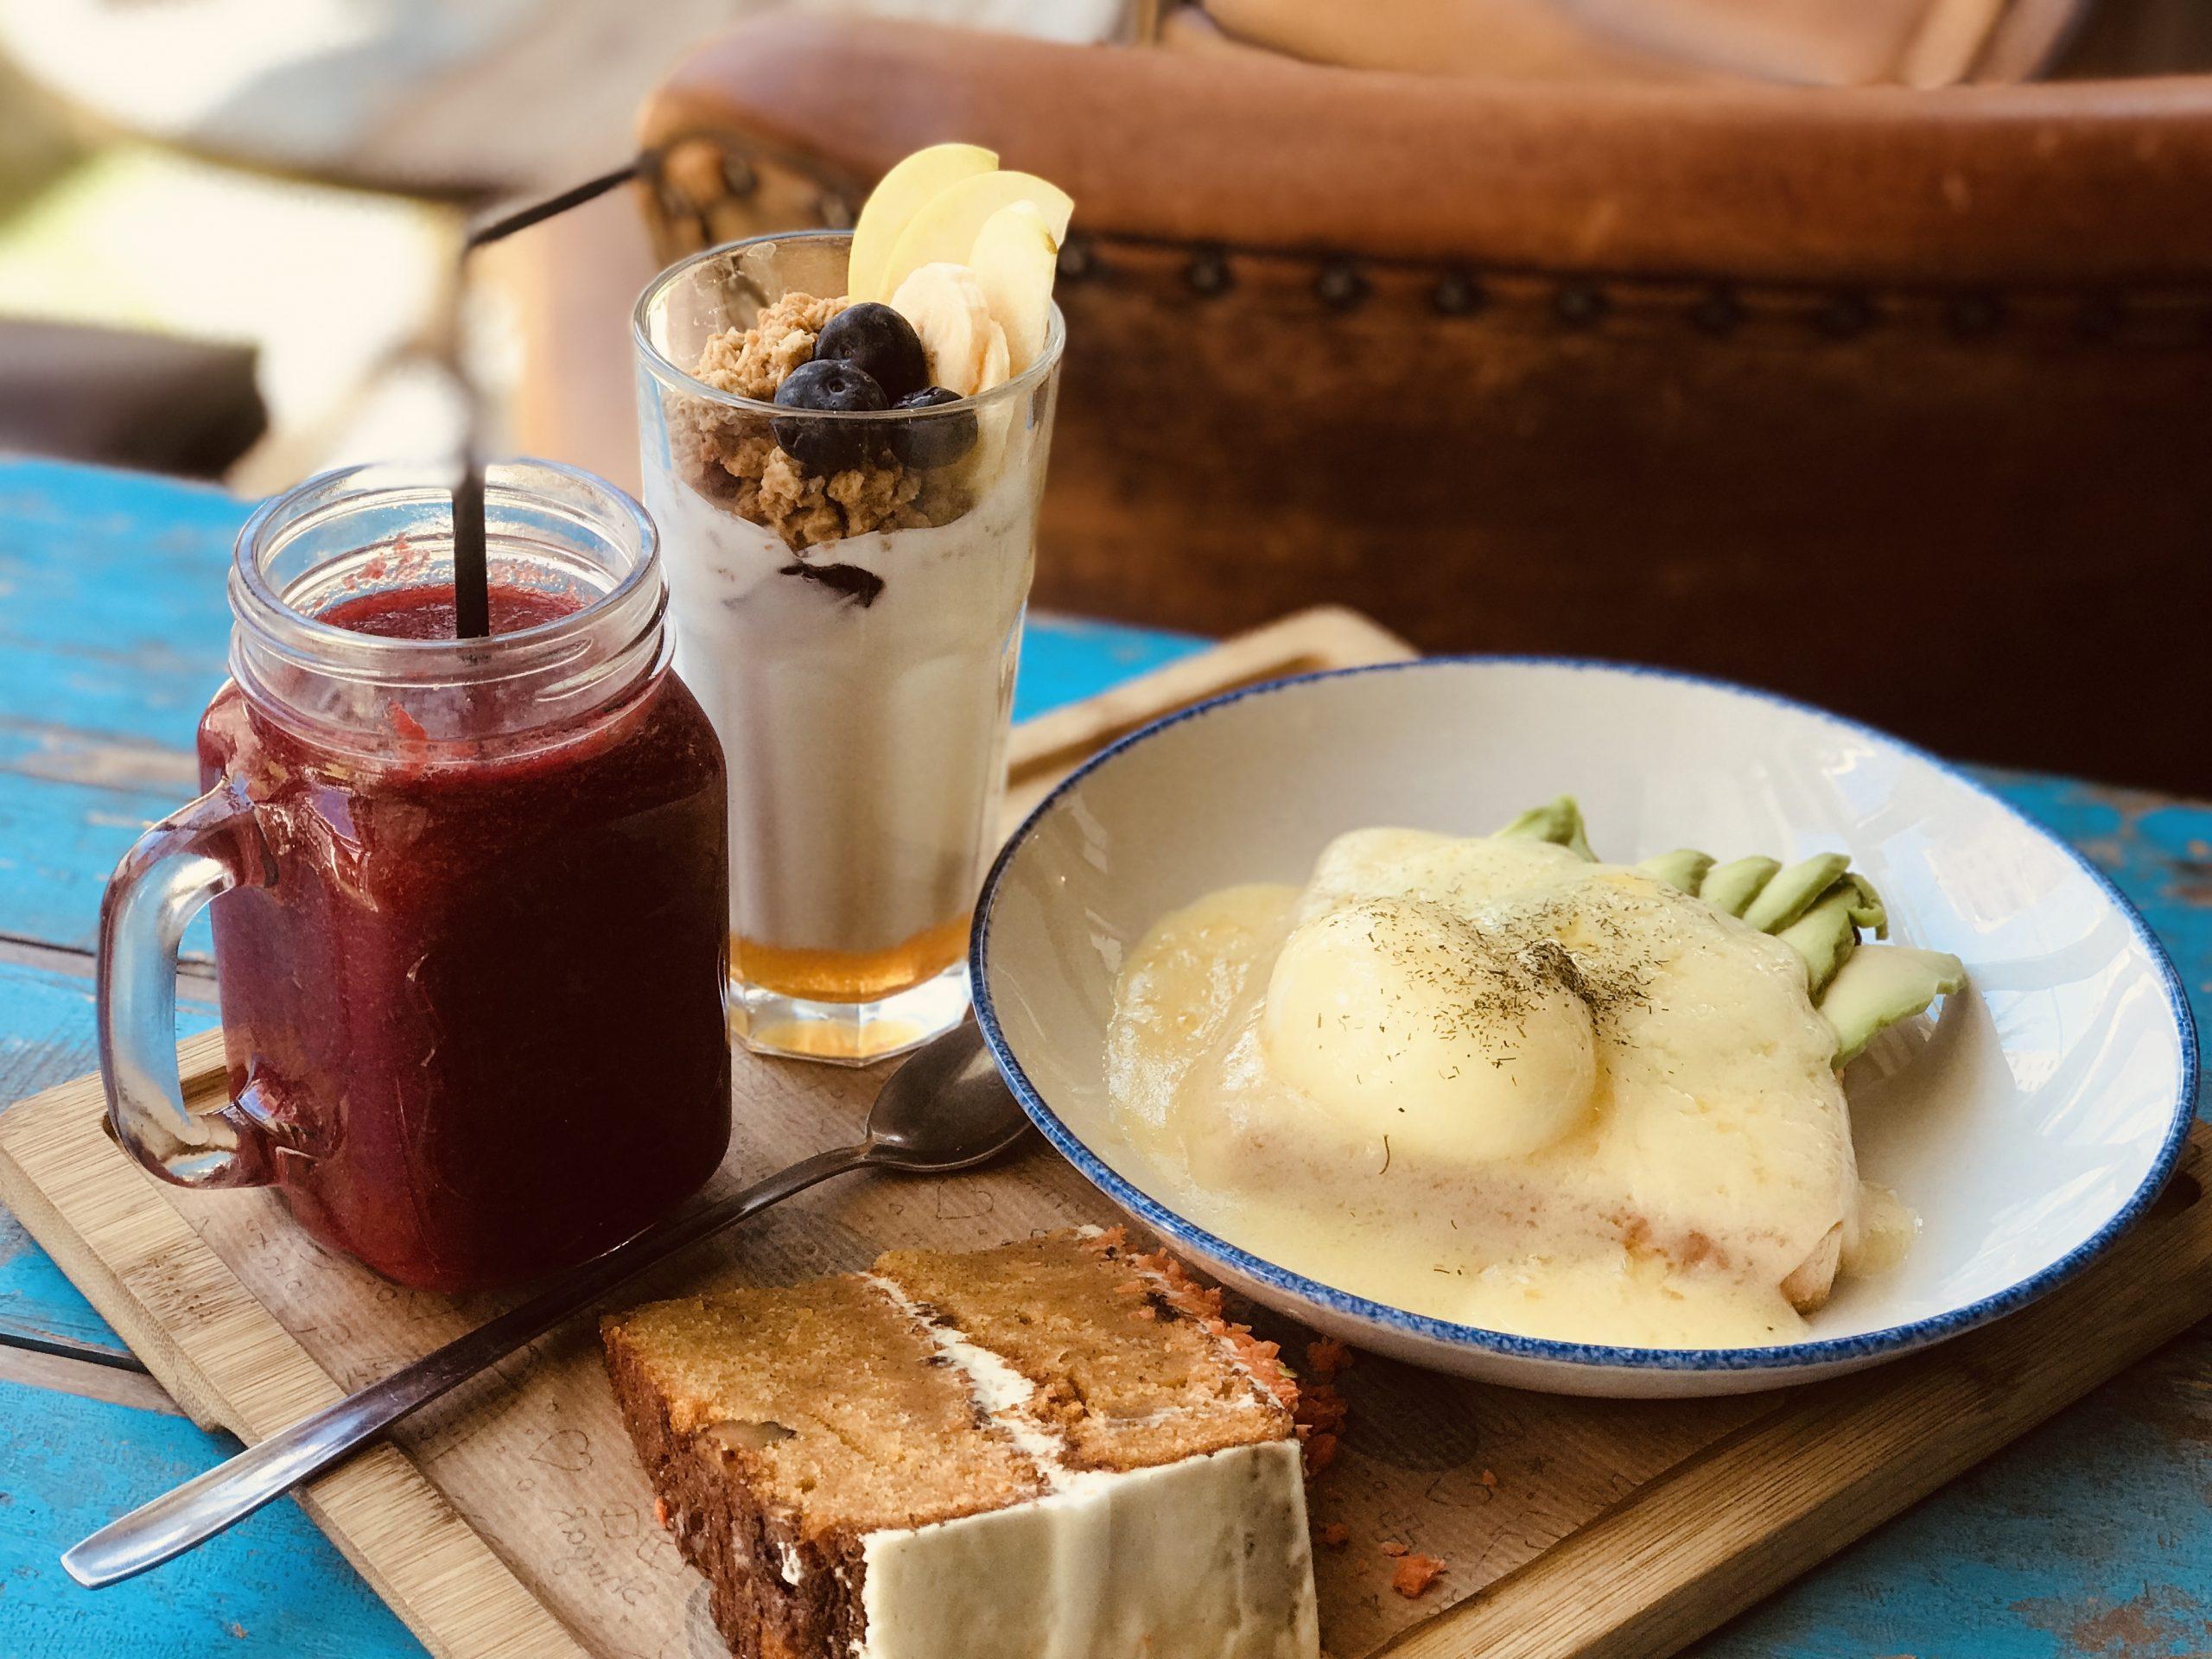 Qué es Baker and Co? | Baker & Co. Desayunos, brunch lunch, tartas carrot,  red velvet, bowls, smoothies.